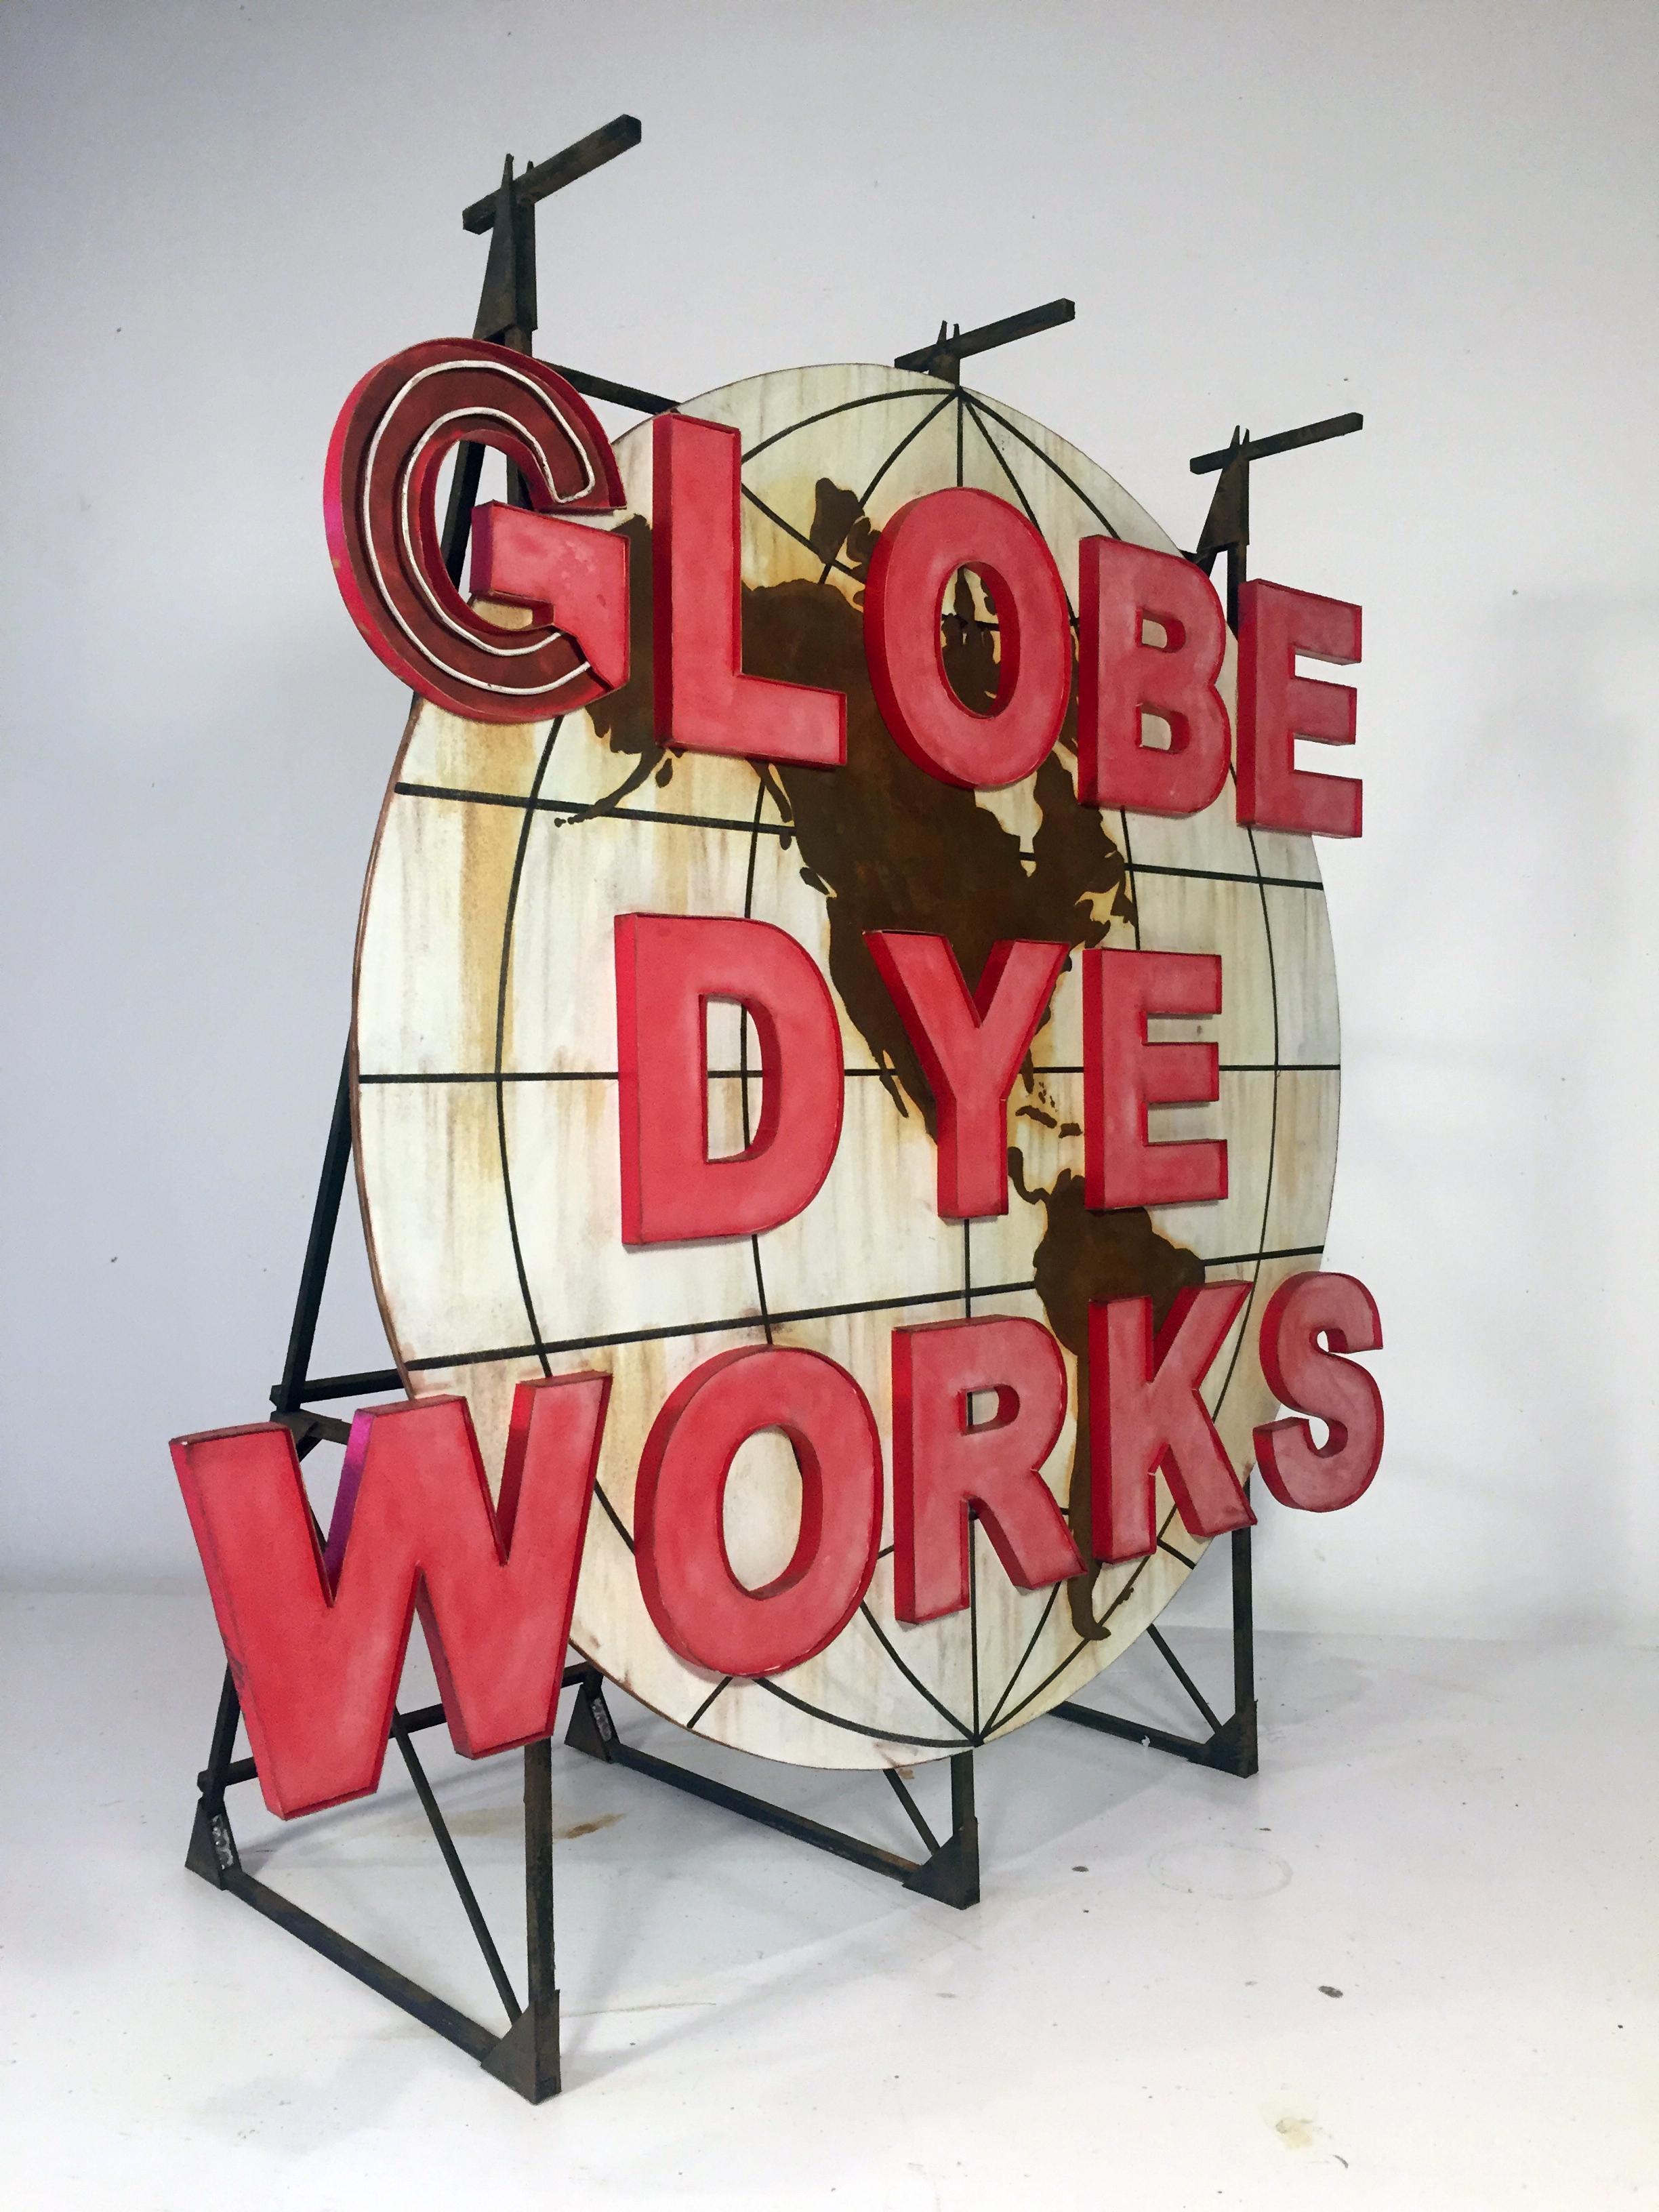 Globe Dye Works - SOLD